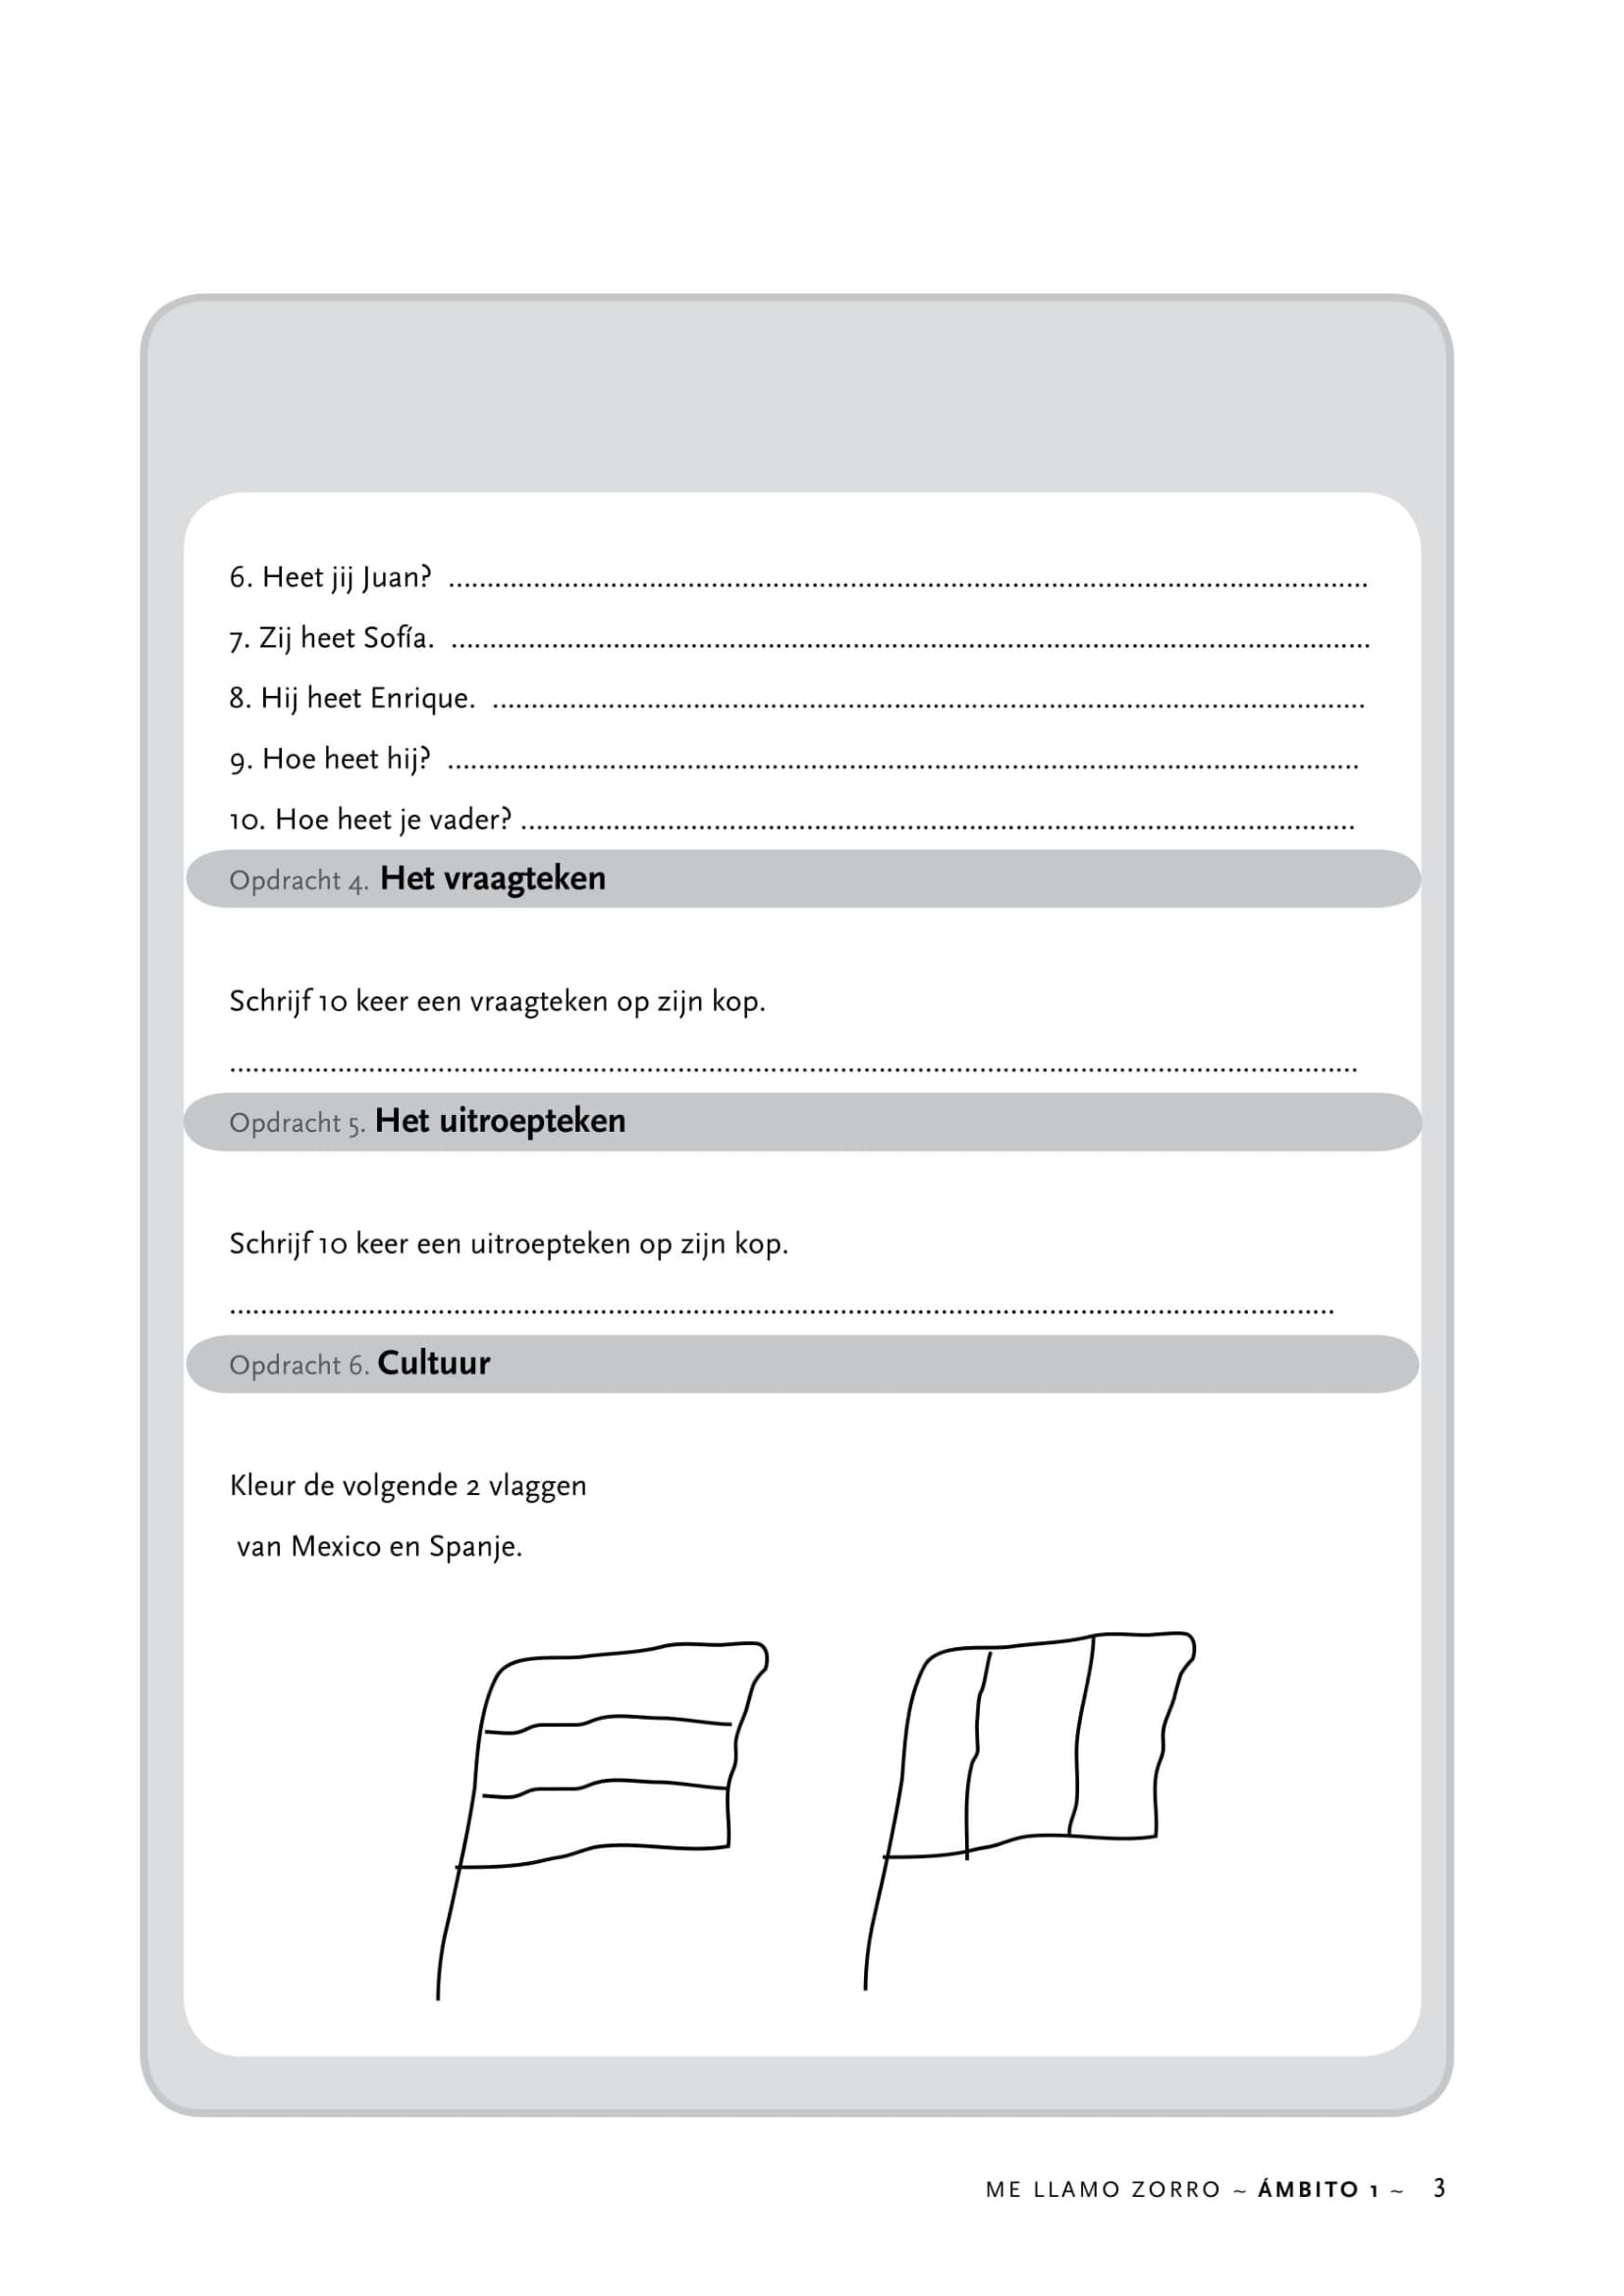 werkboek-hoofdstuk-1-2